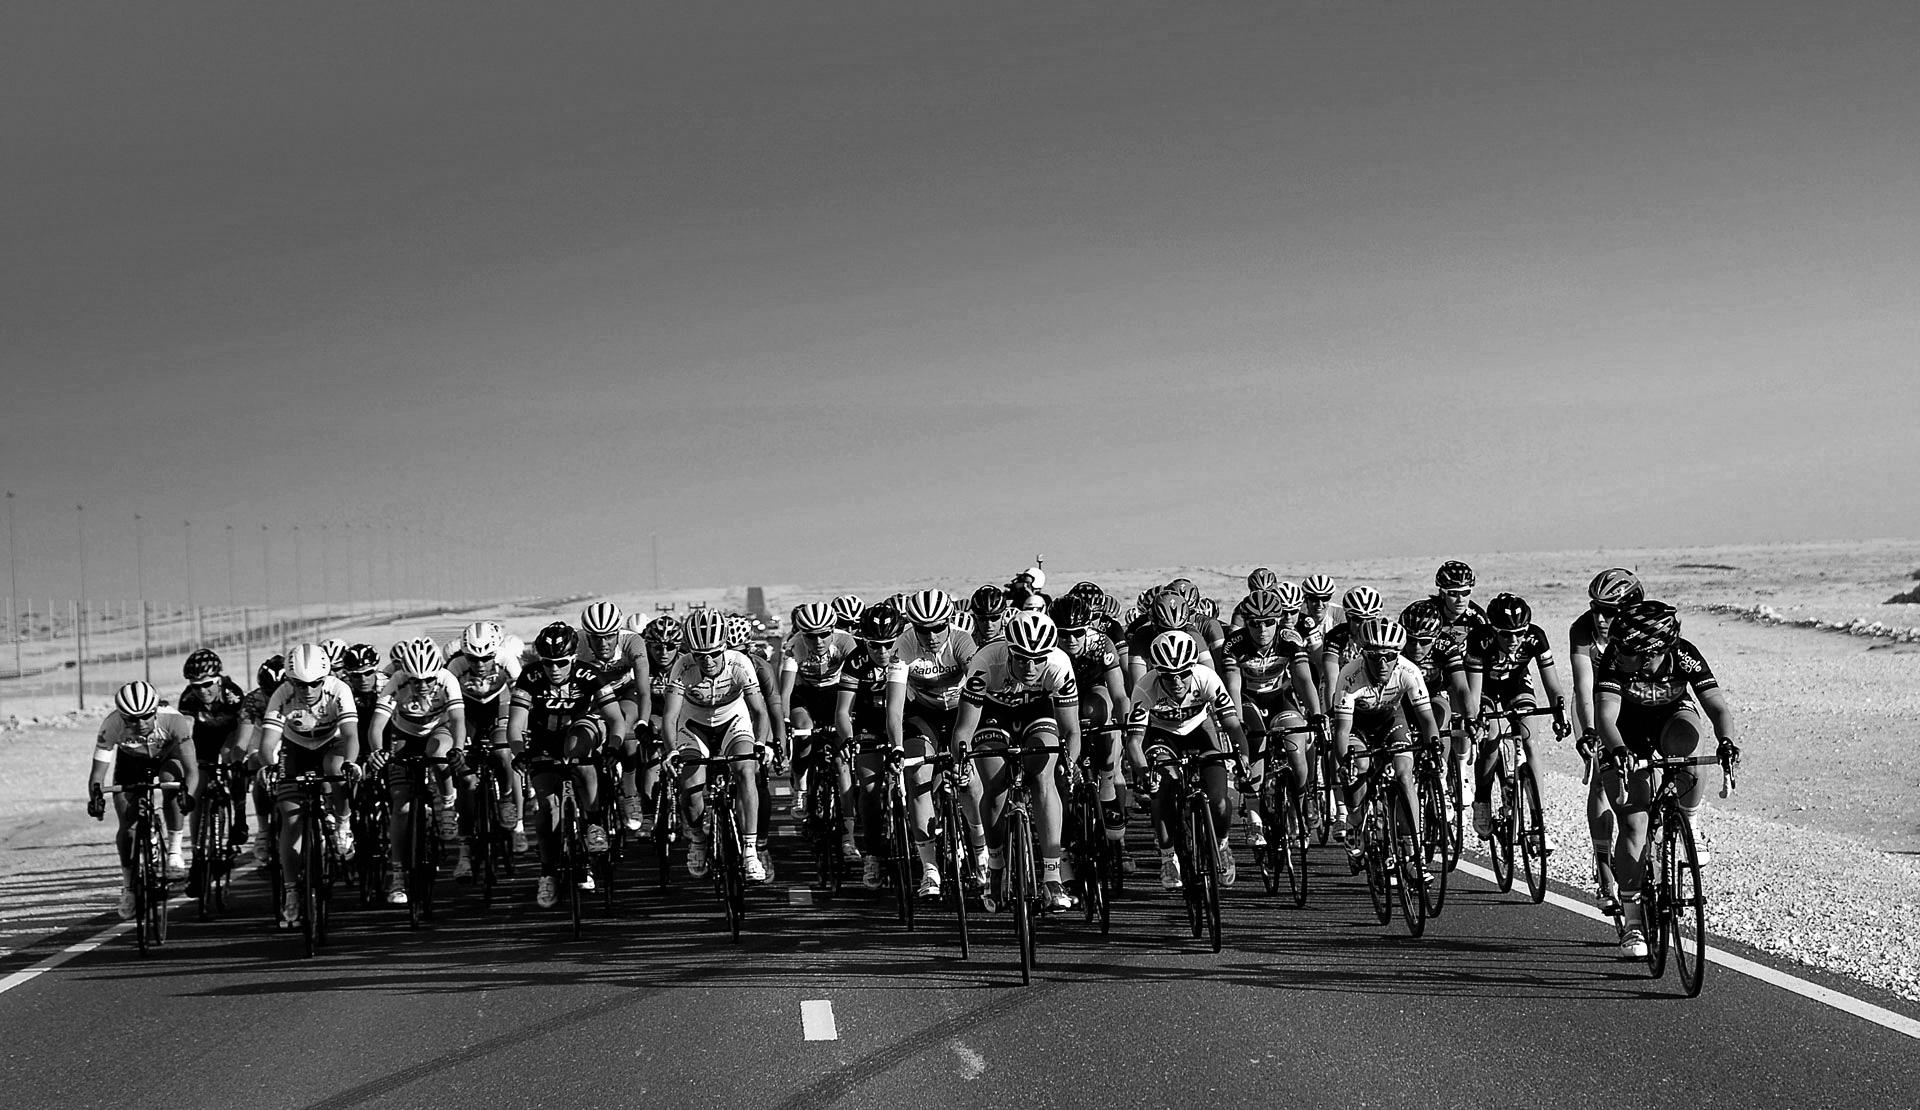 http://carbon.blackink.agency/wp-content/uploads/2015/03/Cycling-n-Qatar.jpg